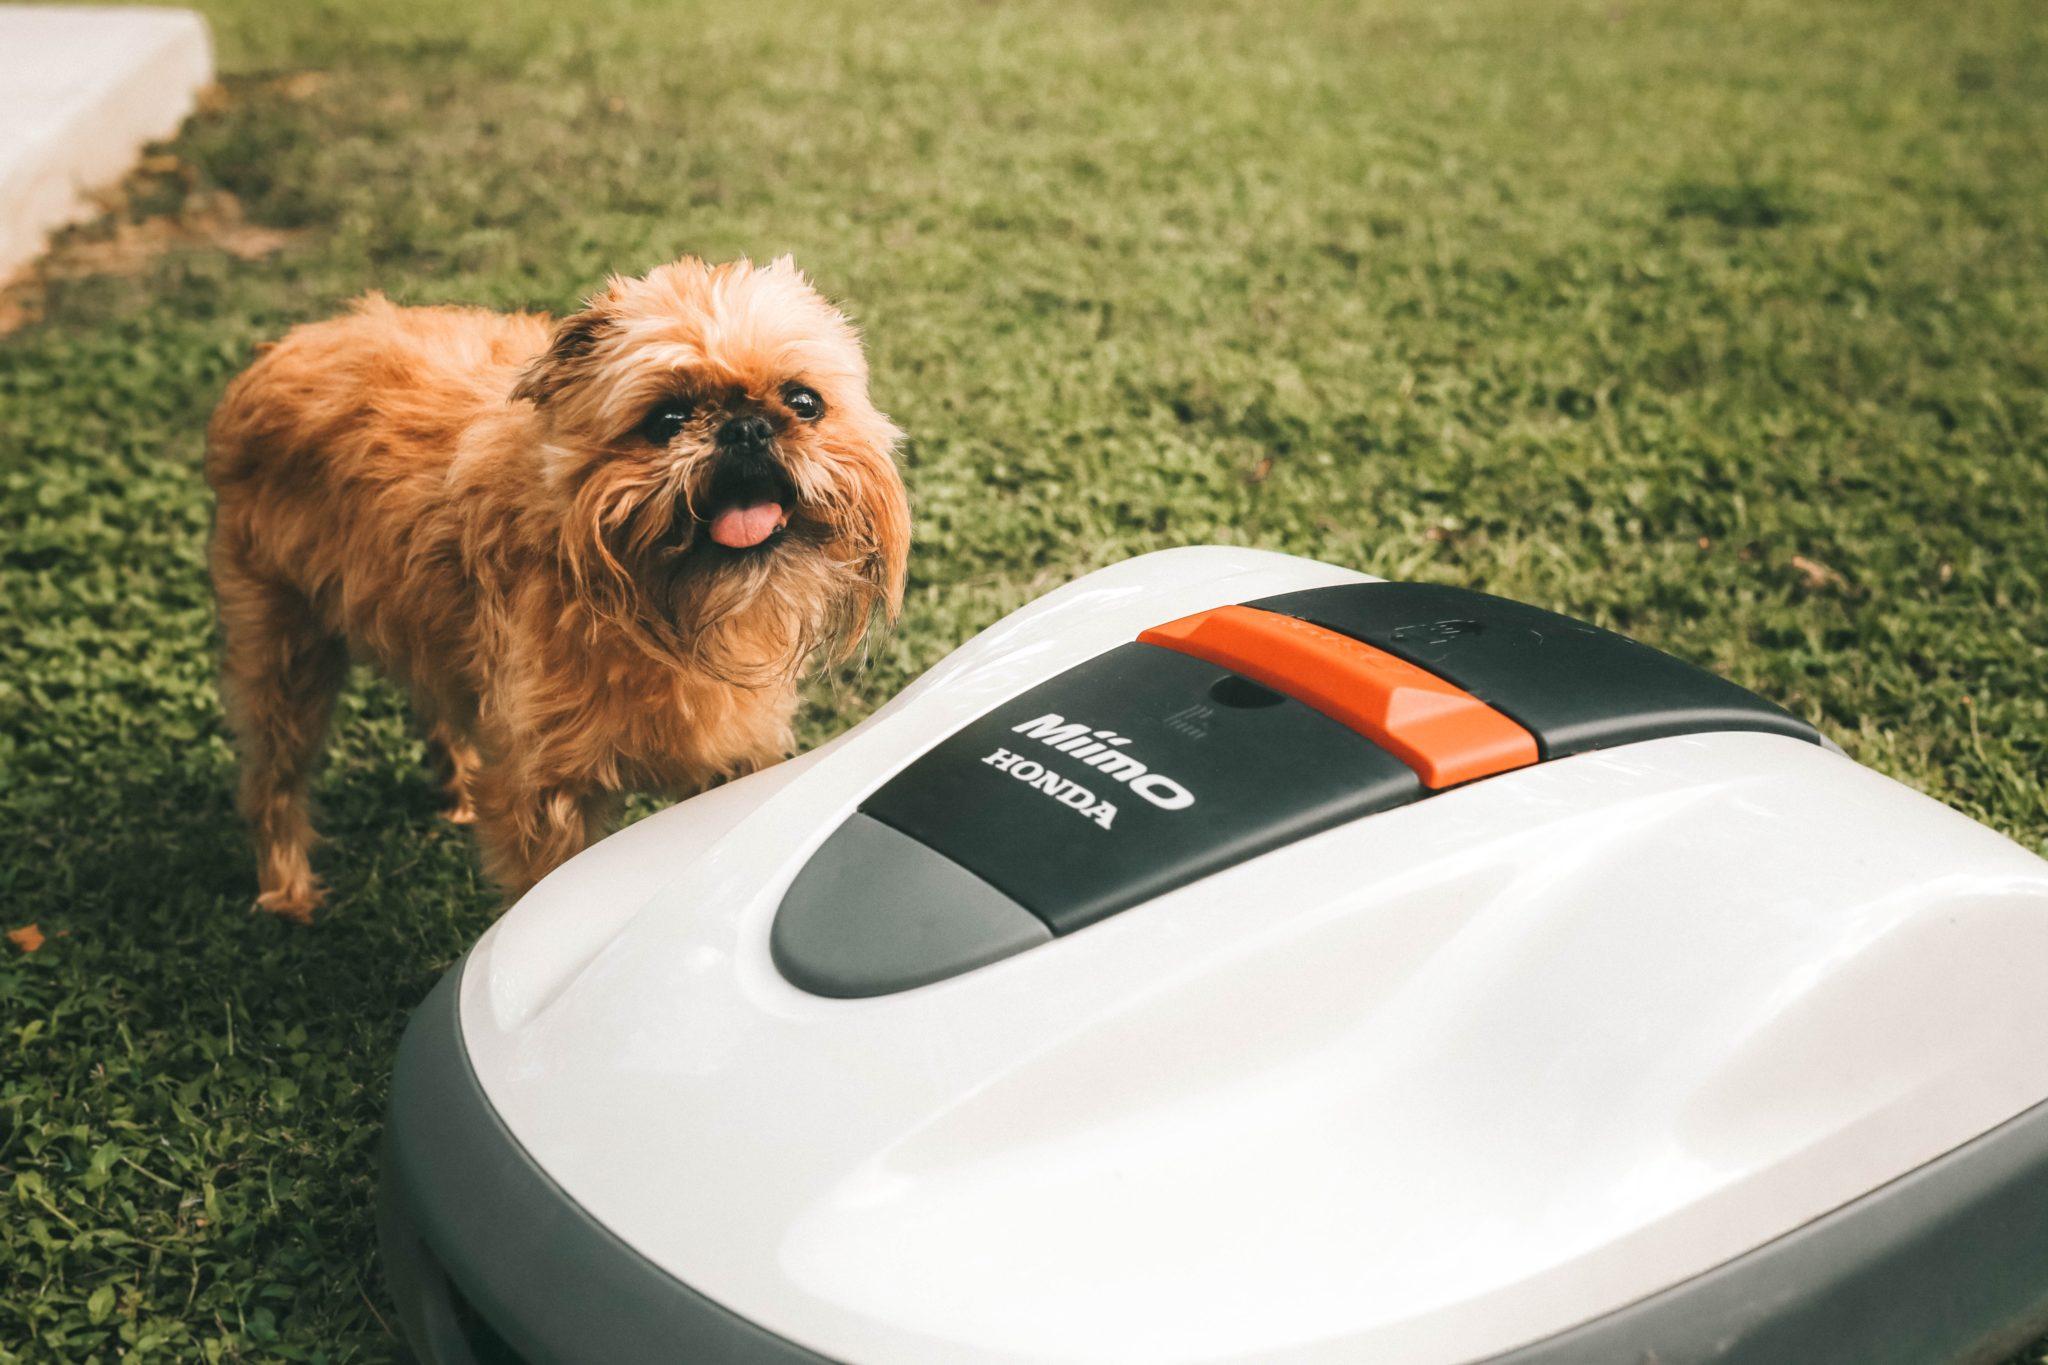 Honda Miimo Robotic Lawn Mower Review by popular Austin lifestyle blog, Dressed to Kill: image of a dog standing next to the Honda Miimo Robotic Lawn Mower.